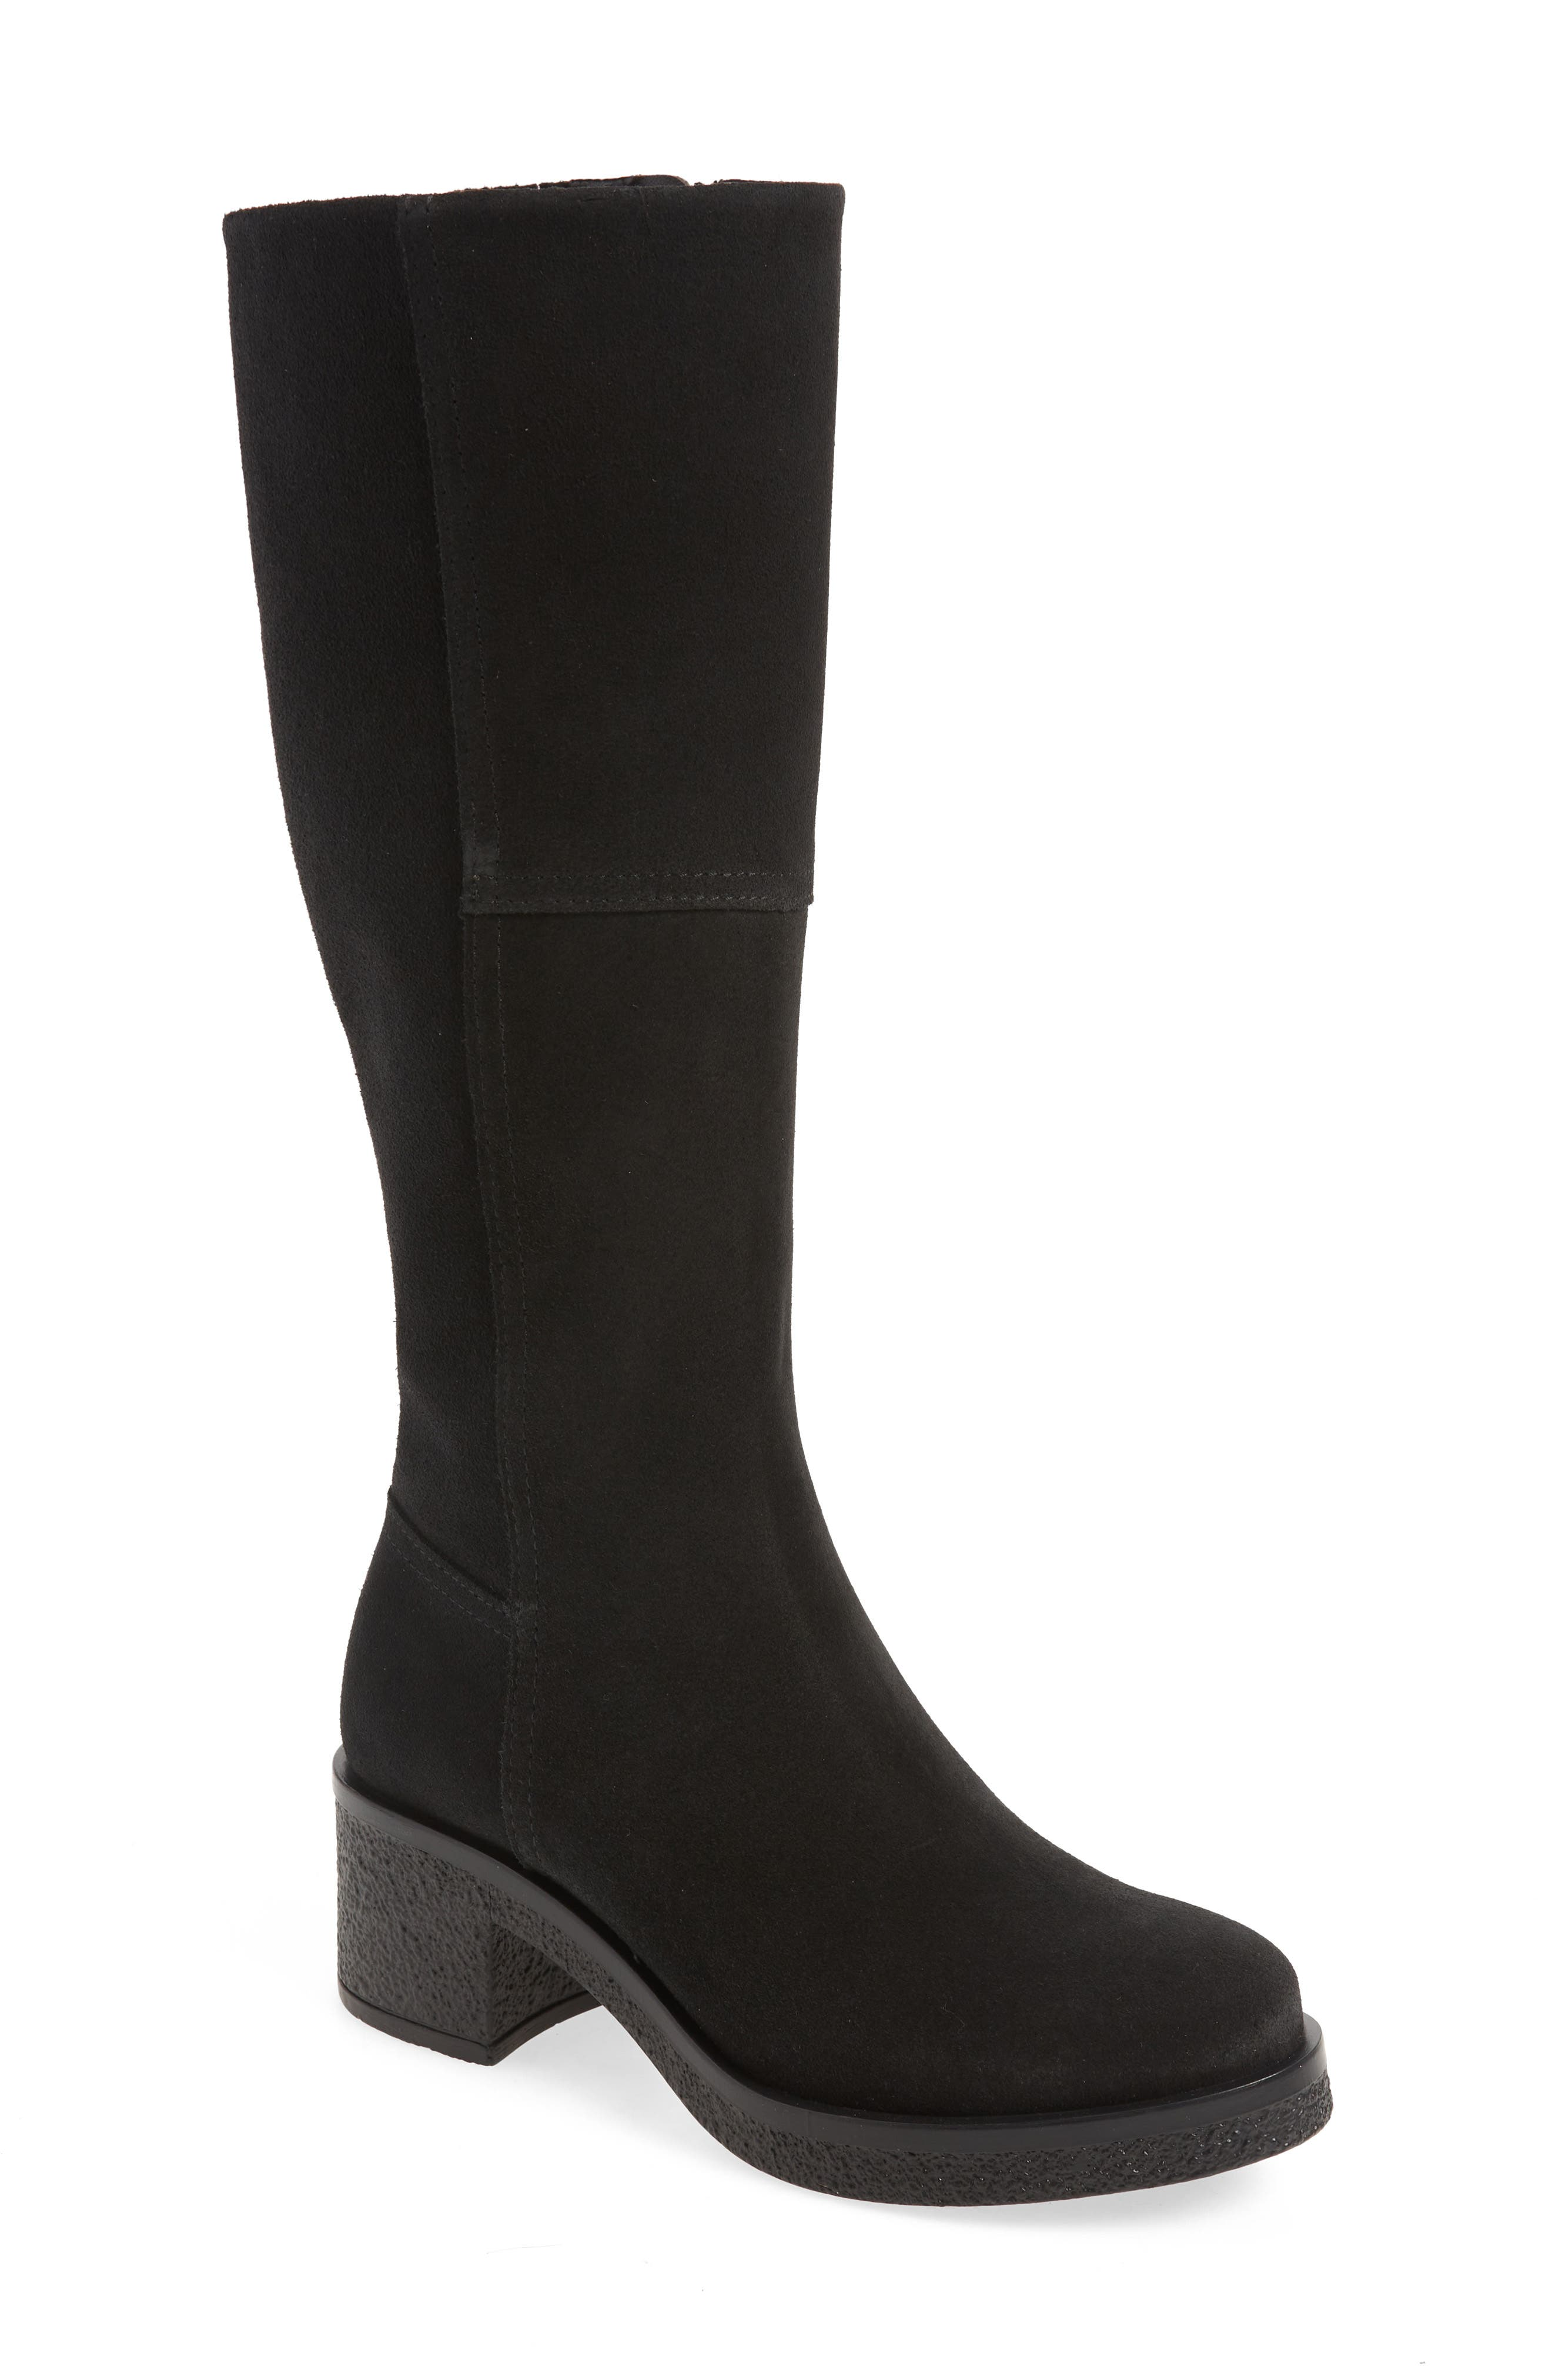 Lana Waterproof Knee High Boot